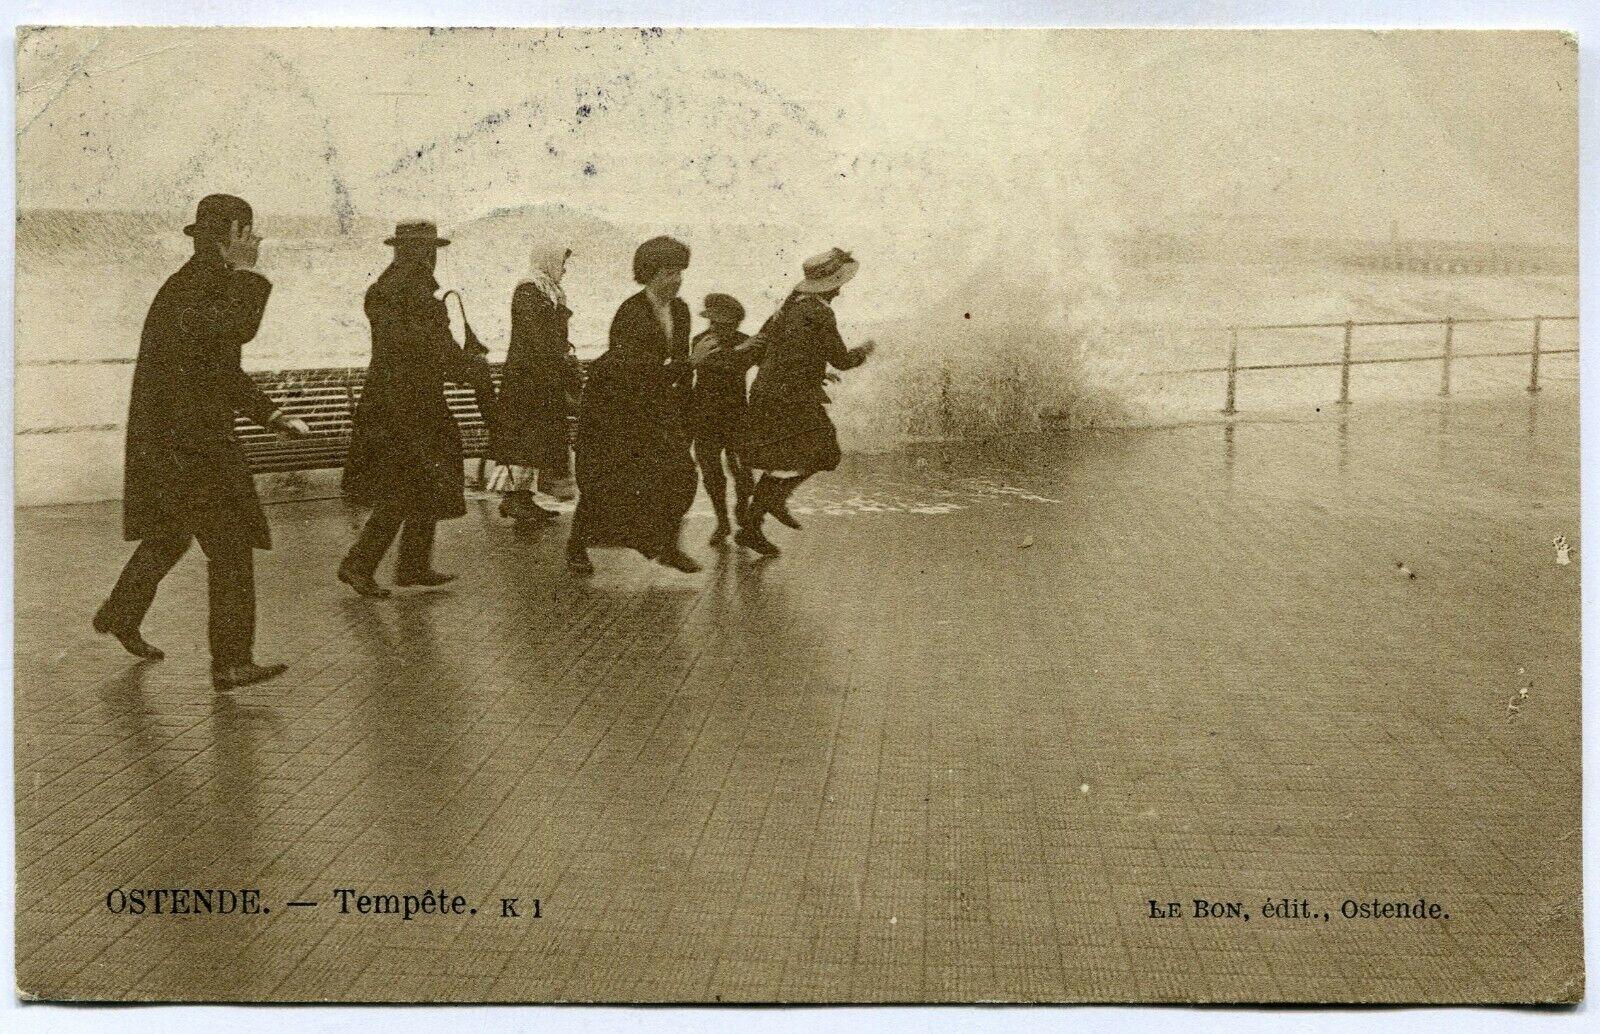 CPA - Carte Postale - Belgique - Ostende - Tempête - 1912 (M7425)